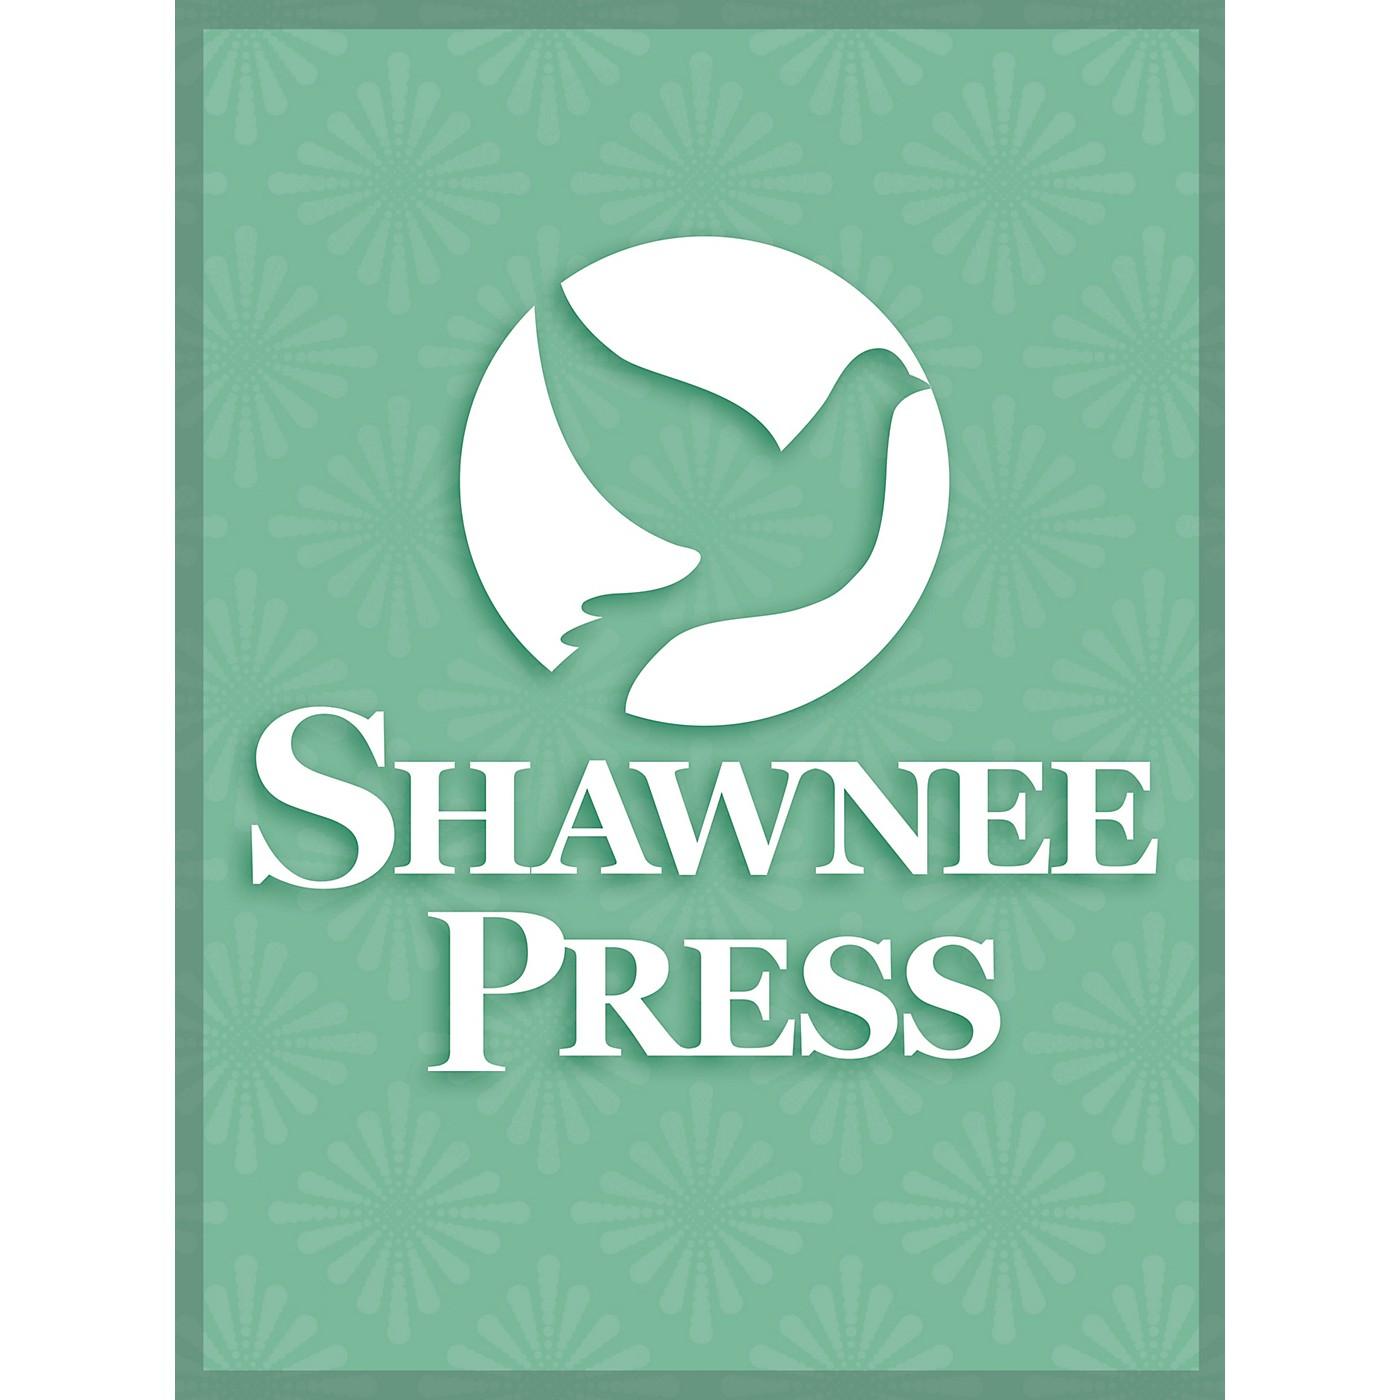 Shawnee Press Cascades (3-6 Octaves of Handbells Level 4) Composed by Karen Buckwalter thumbnail